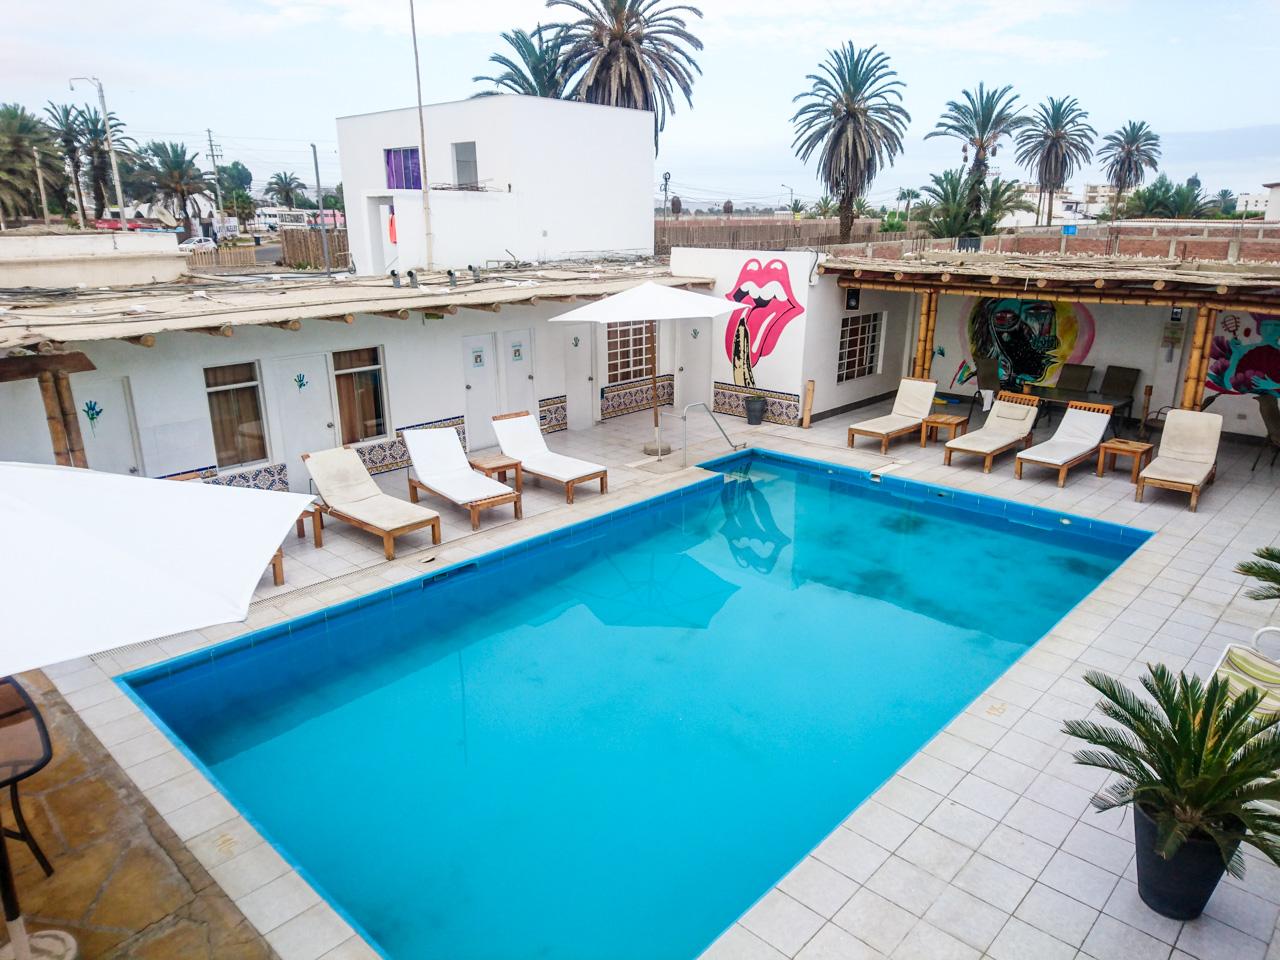 paracas-kokopelli-hostel